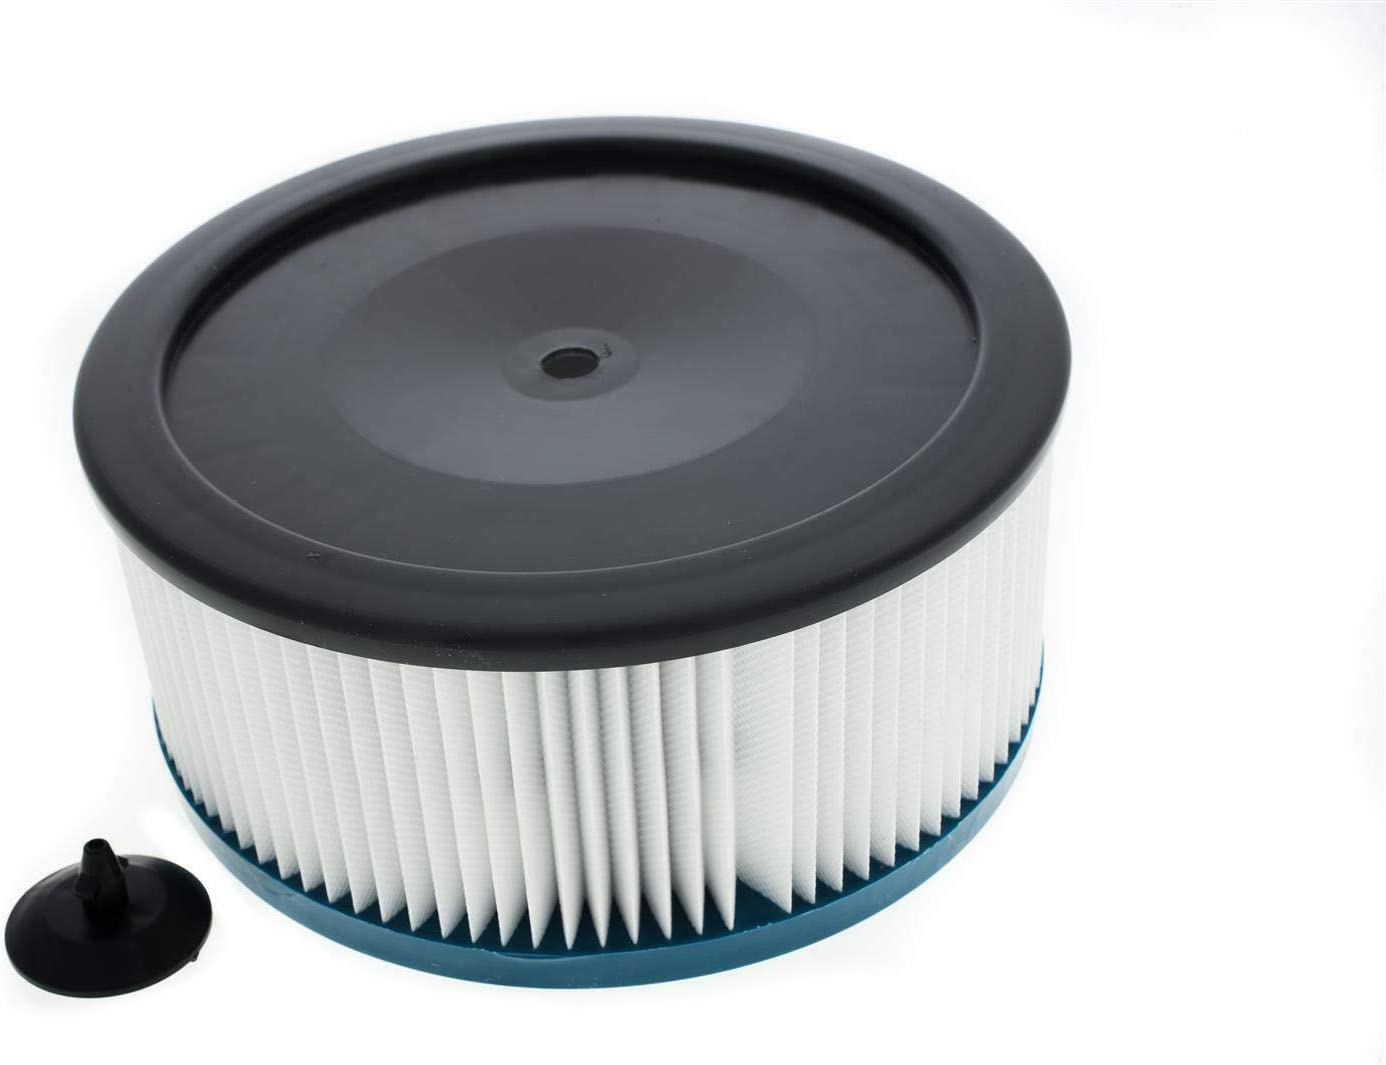 Faltenfilter für Starmix FP3600 FPP 3600 FPP3600 FP 3600